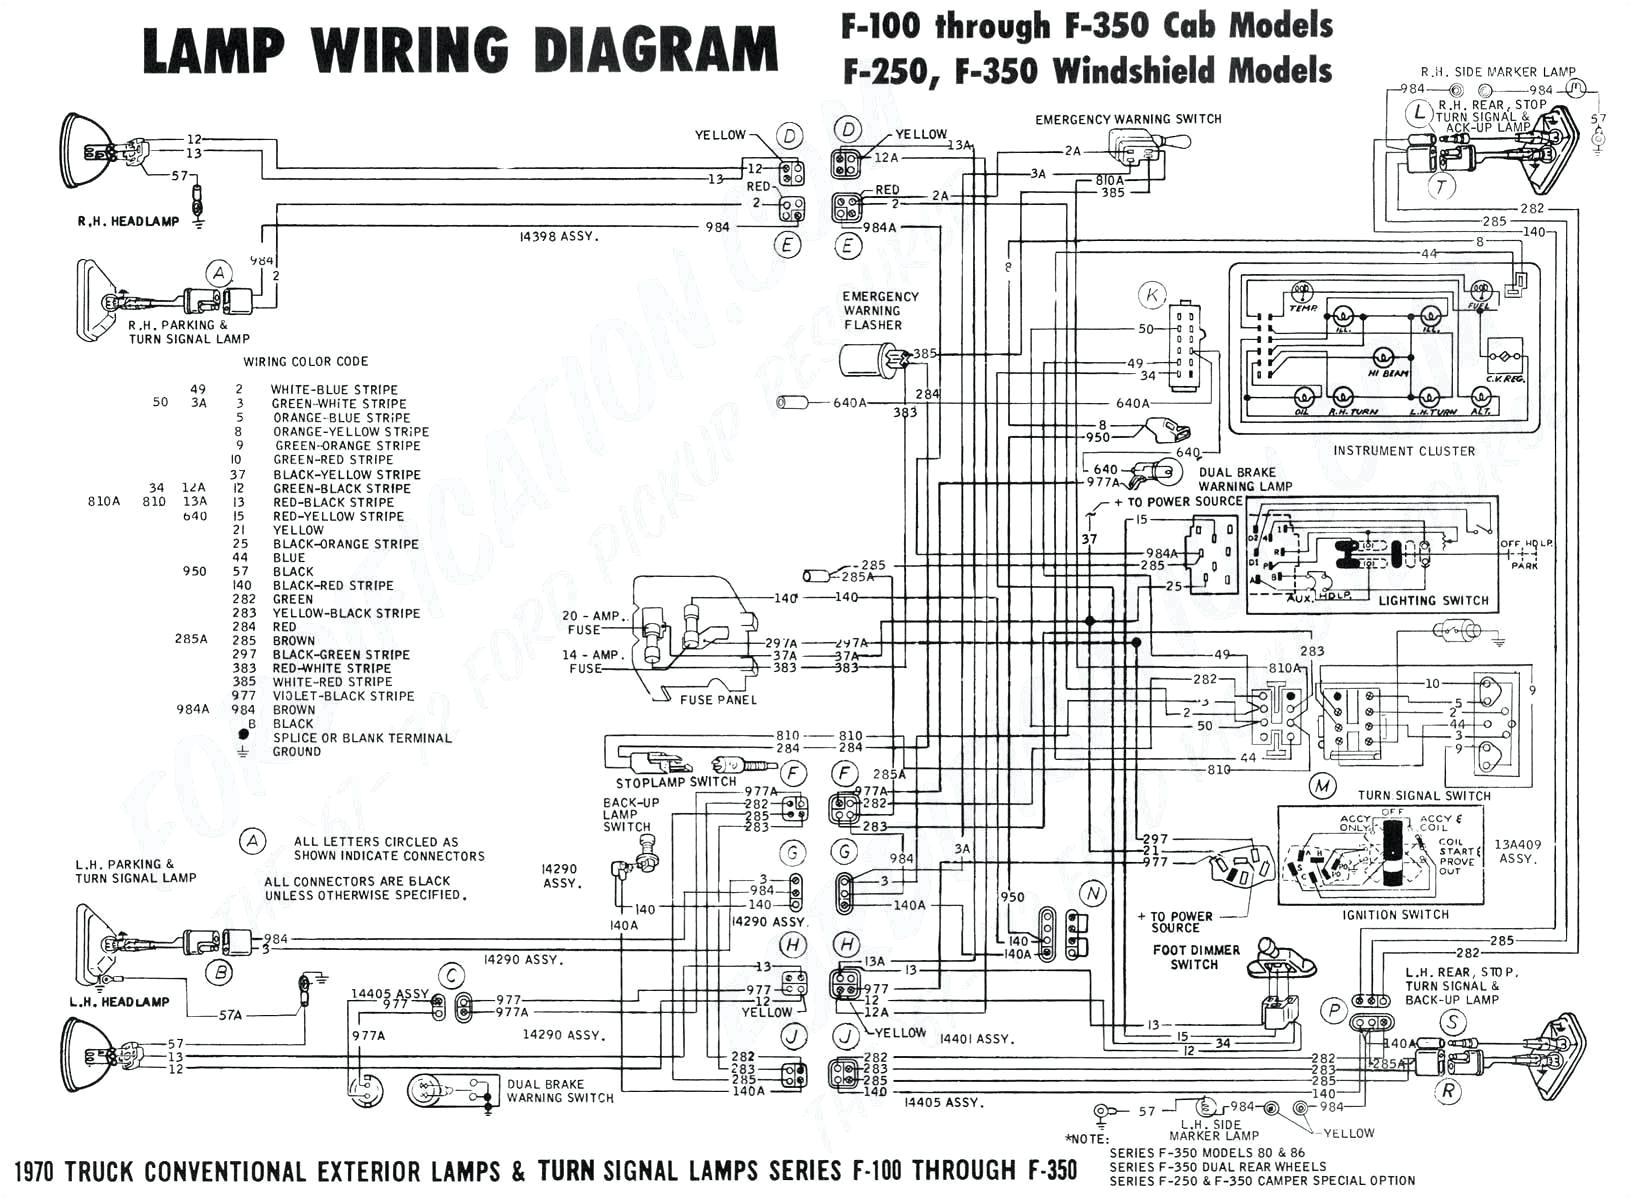 2011 silverado tail light wiring diagram 2005 chevy silverado tail light wiring diagram unique trailer ford of 2011 silverado tail light wiring diagram jpg